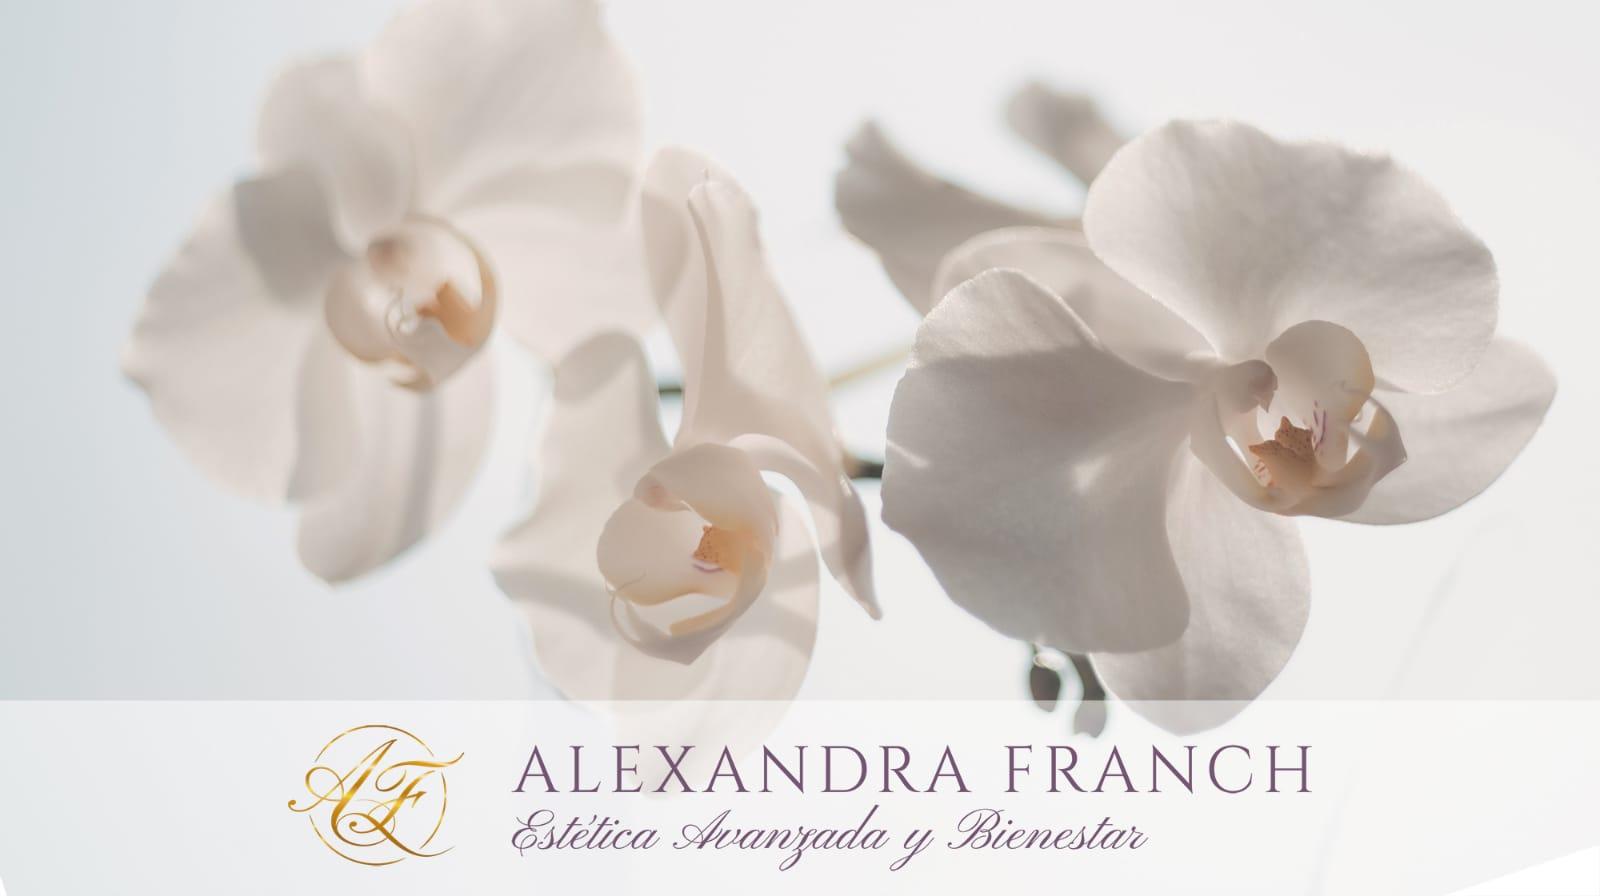 alexandra Franchjpg